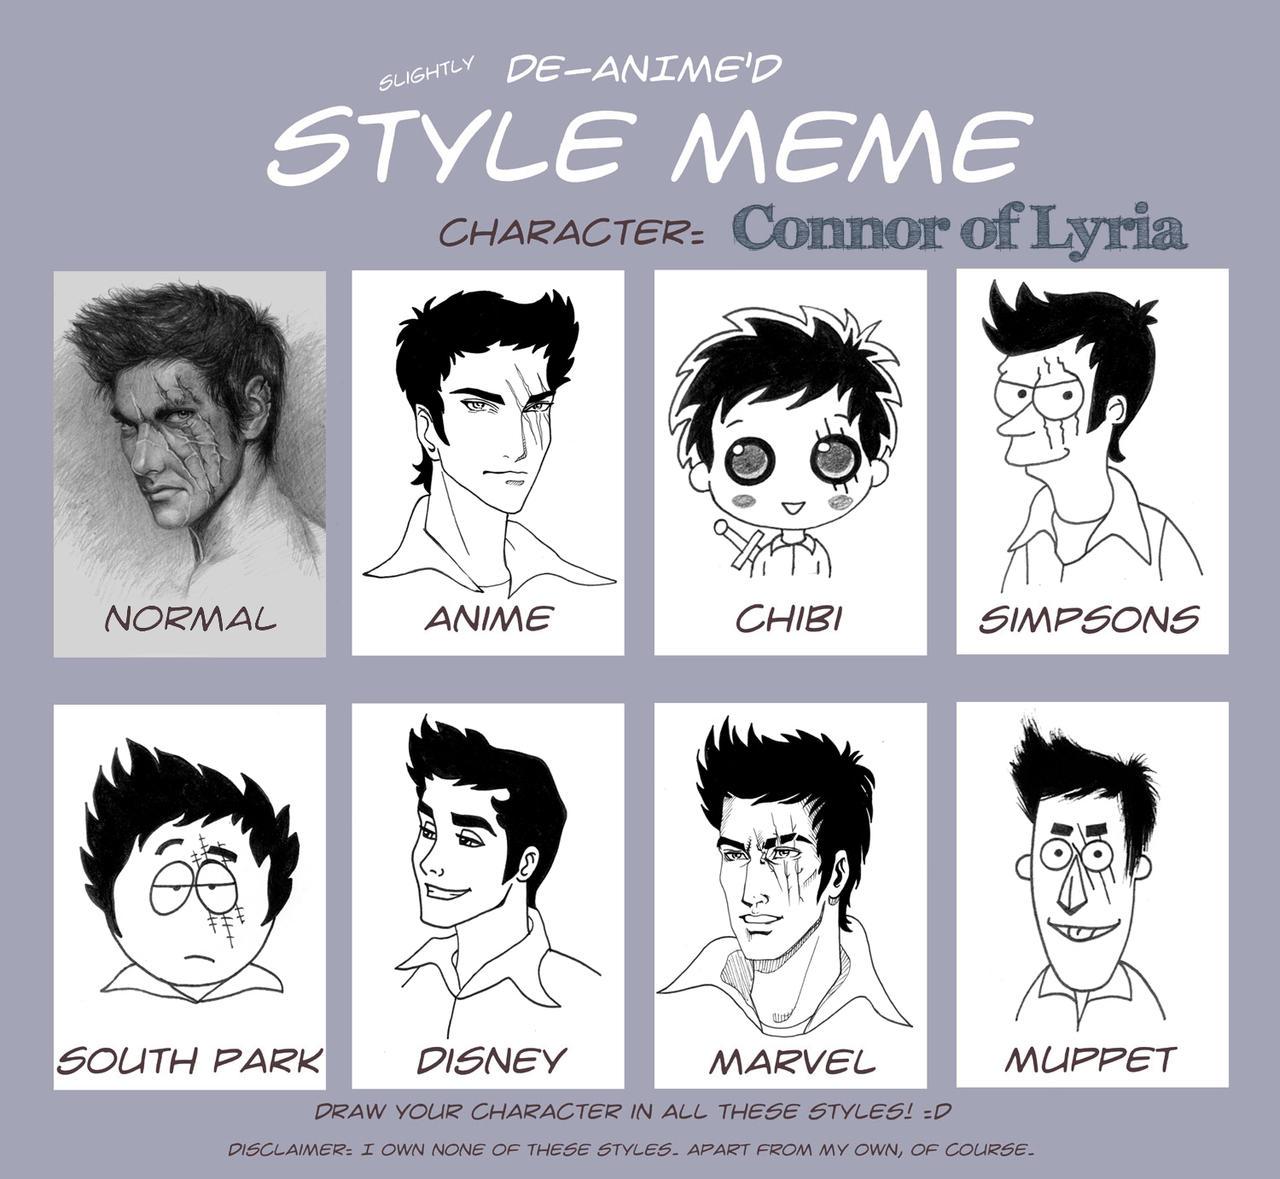 Harry Potter Muppets: Connor On De Anime Style Meme By MIHO24 On DeviantArt